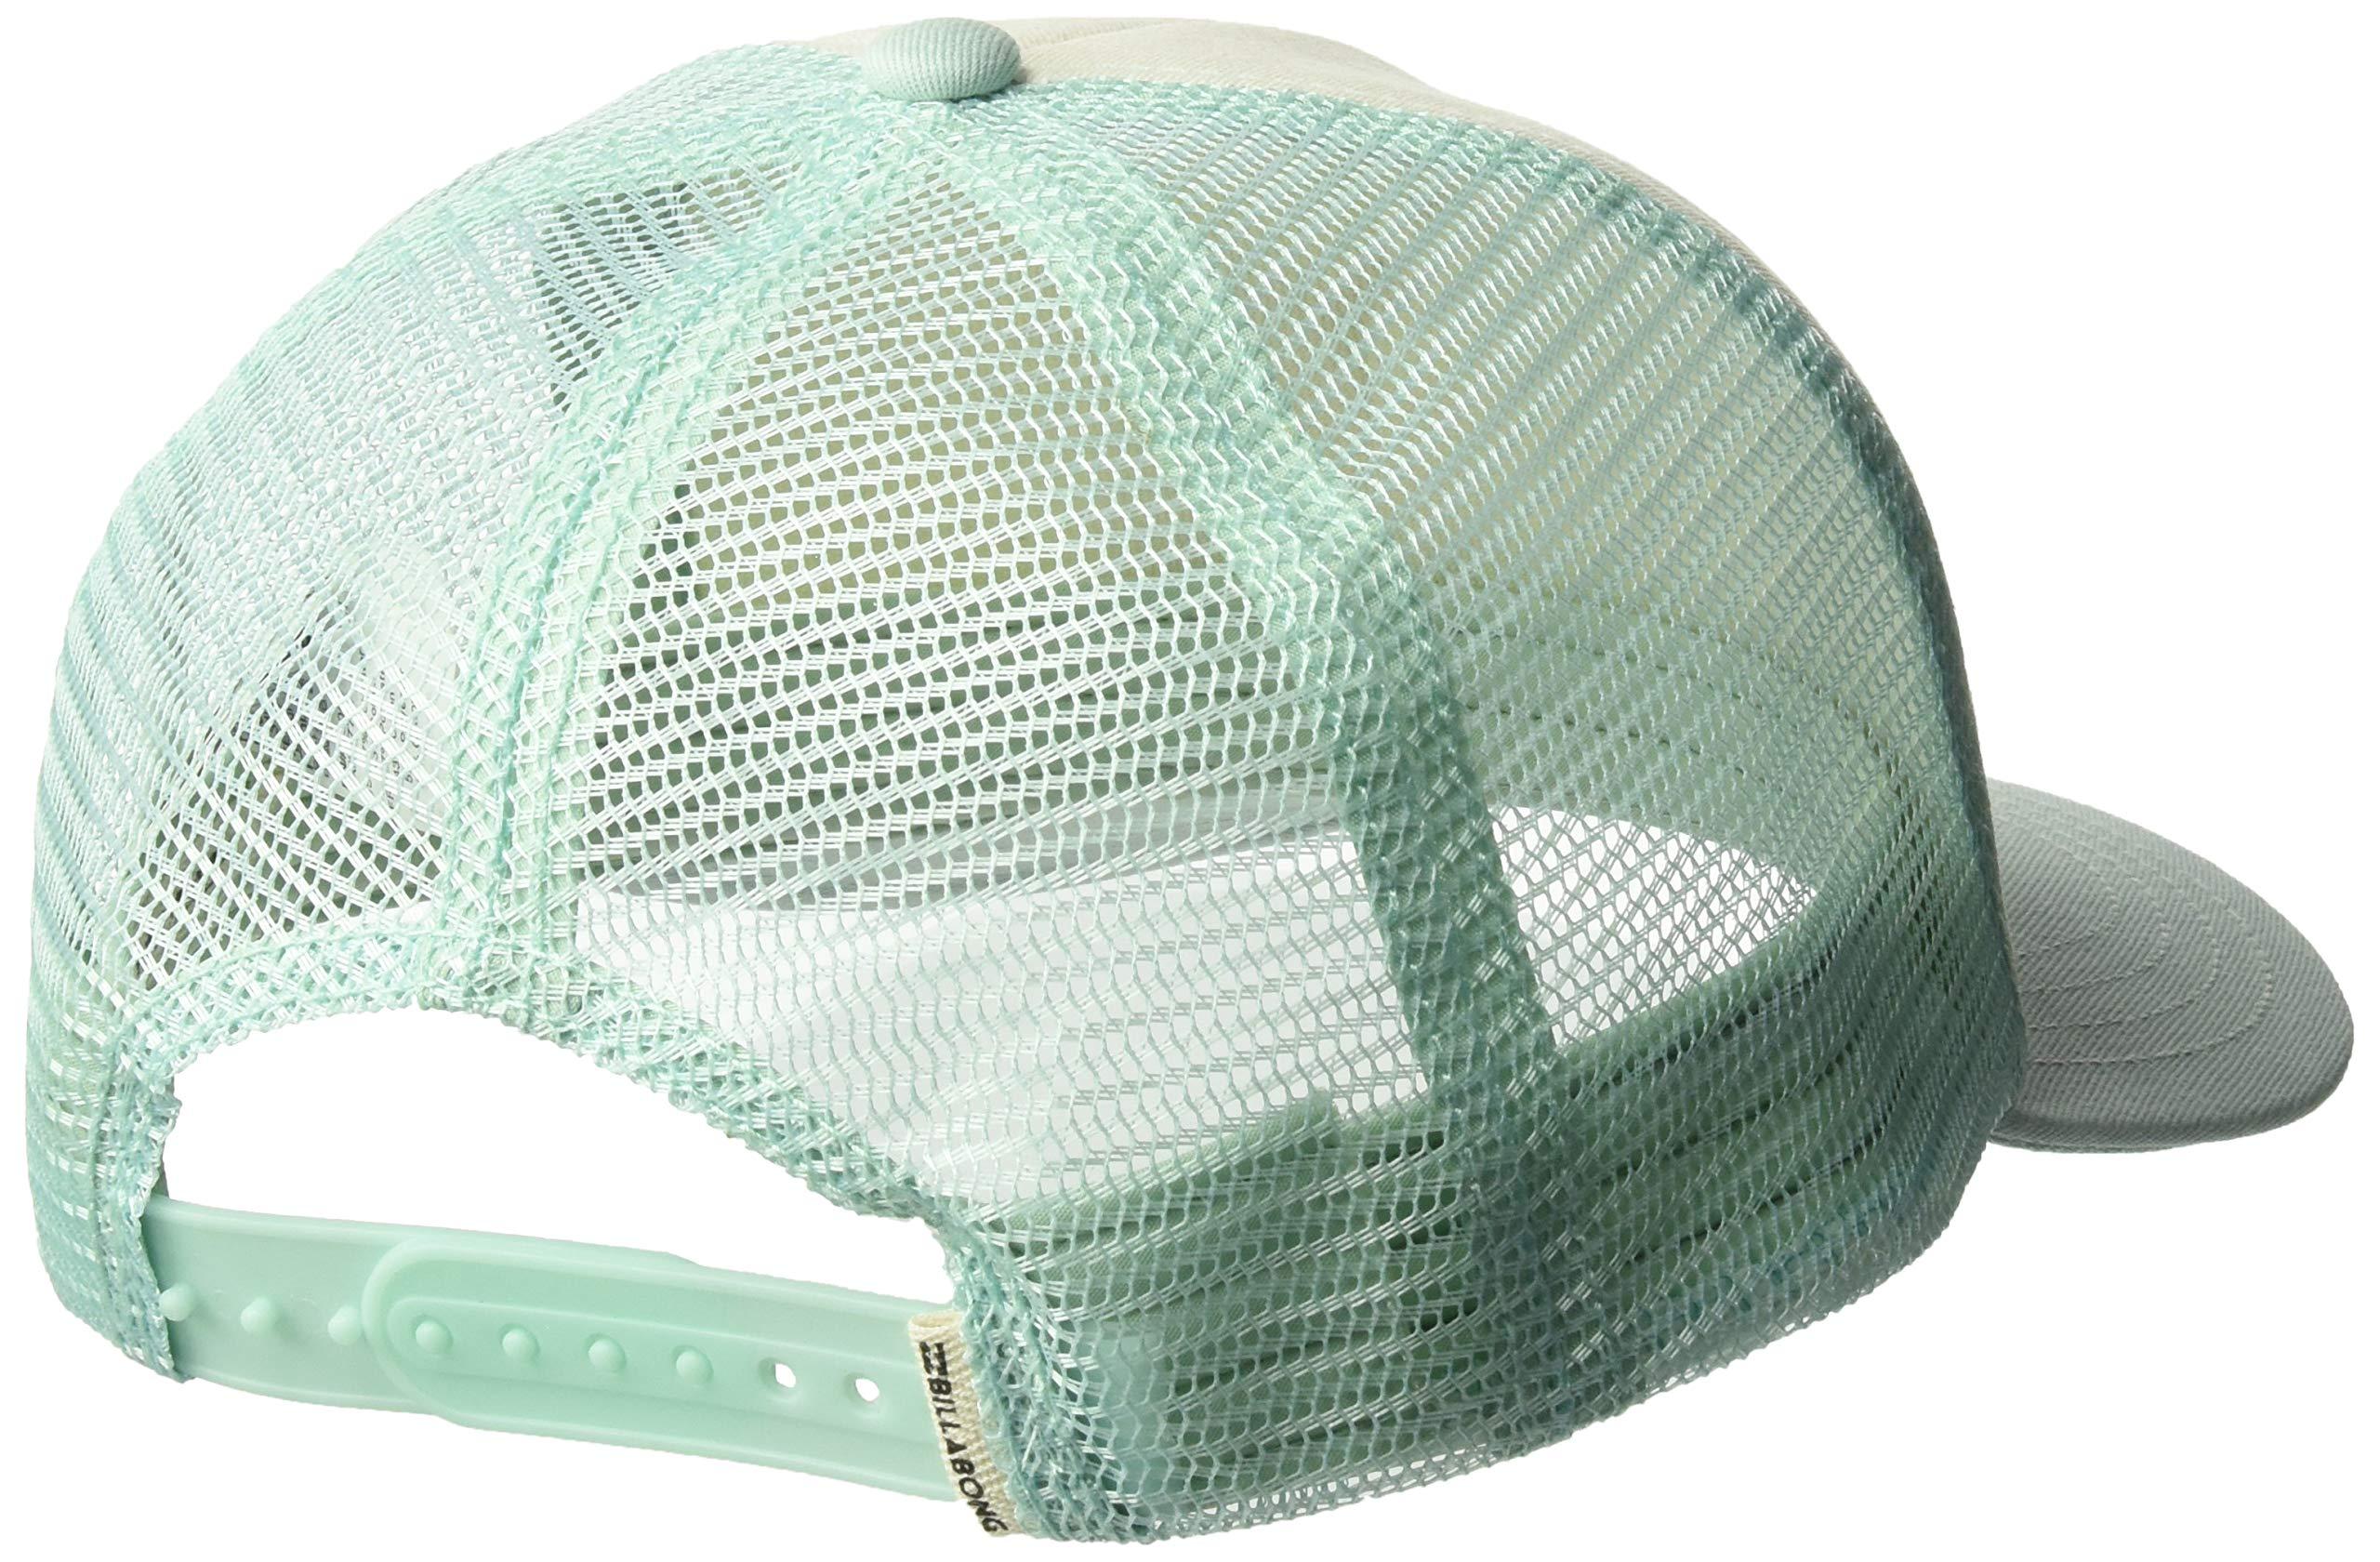 Billabong Girls' Big Cali Vibes Hat, Beach Glass, ONE by Billabong (Image #2)